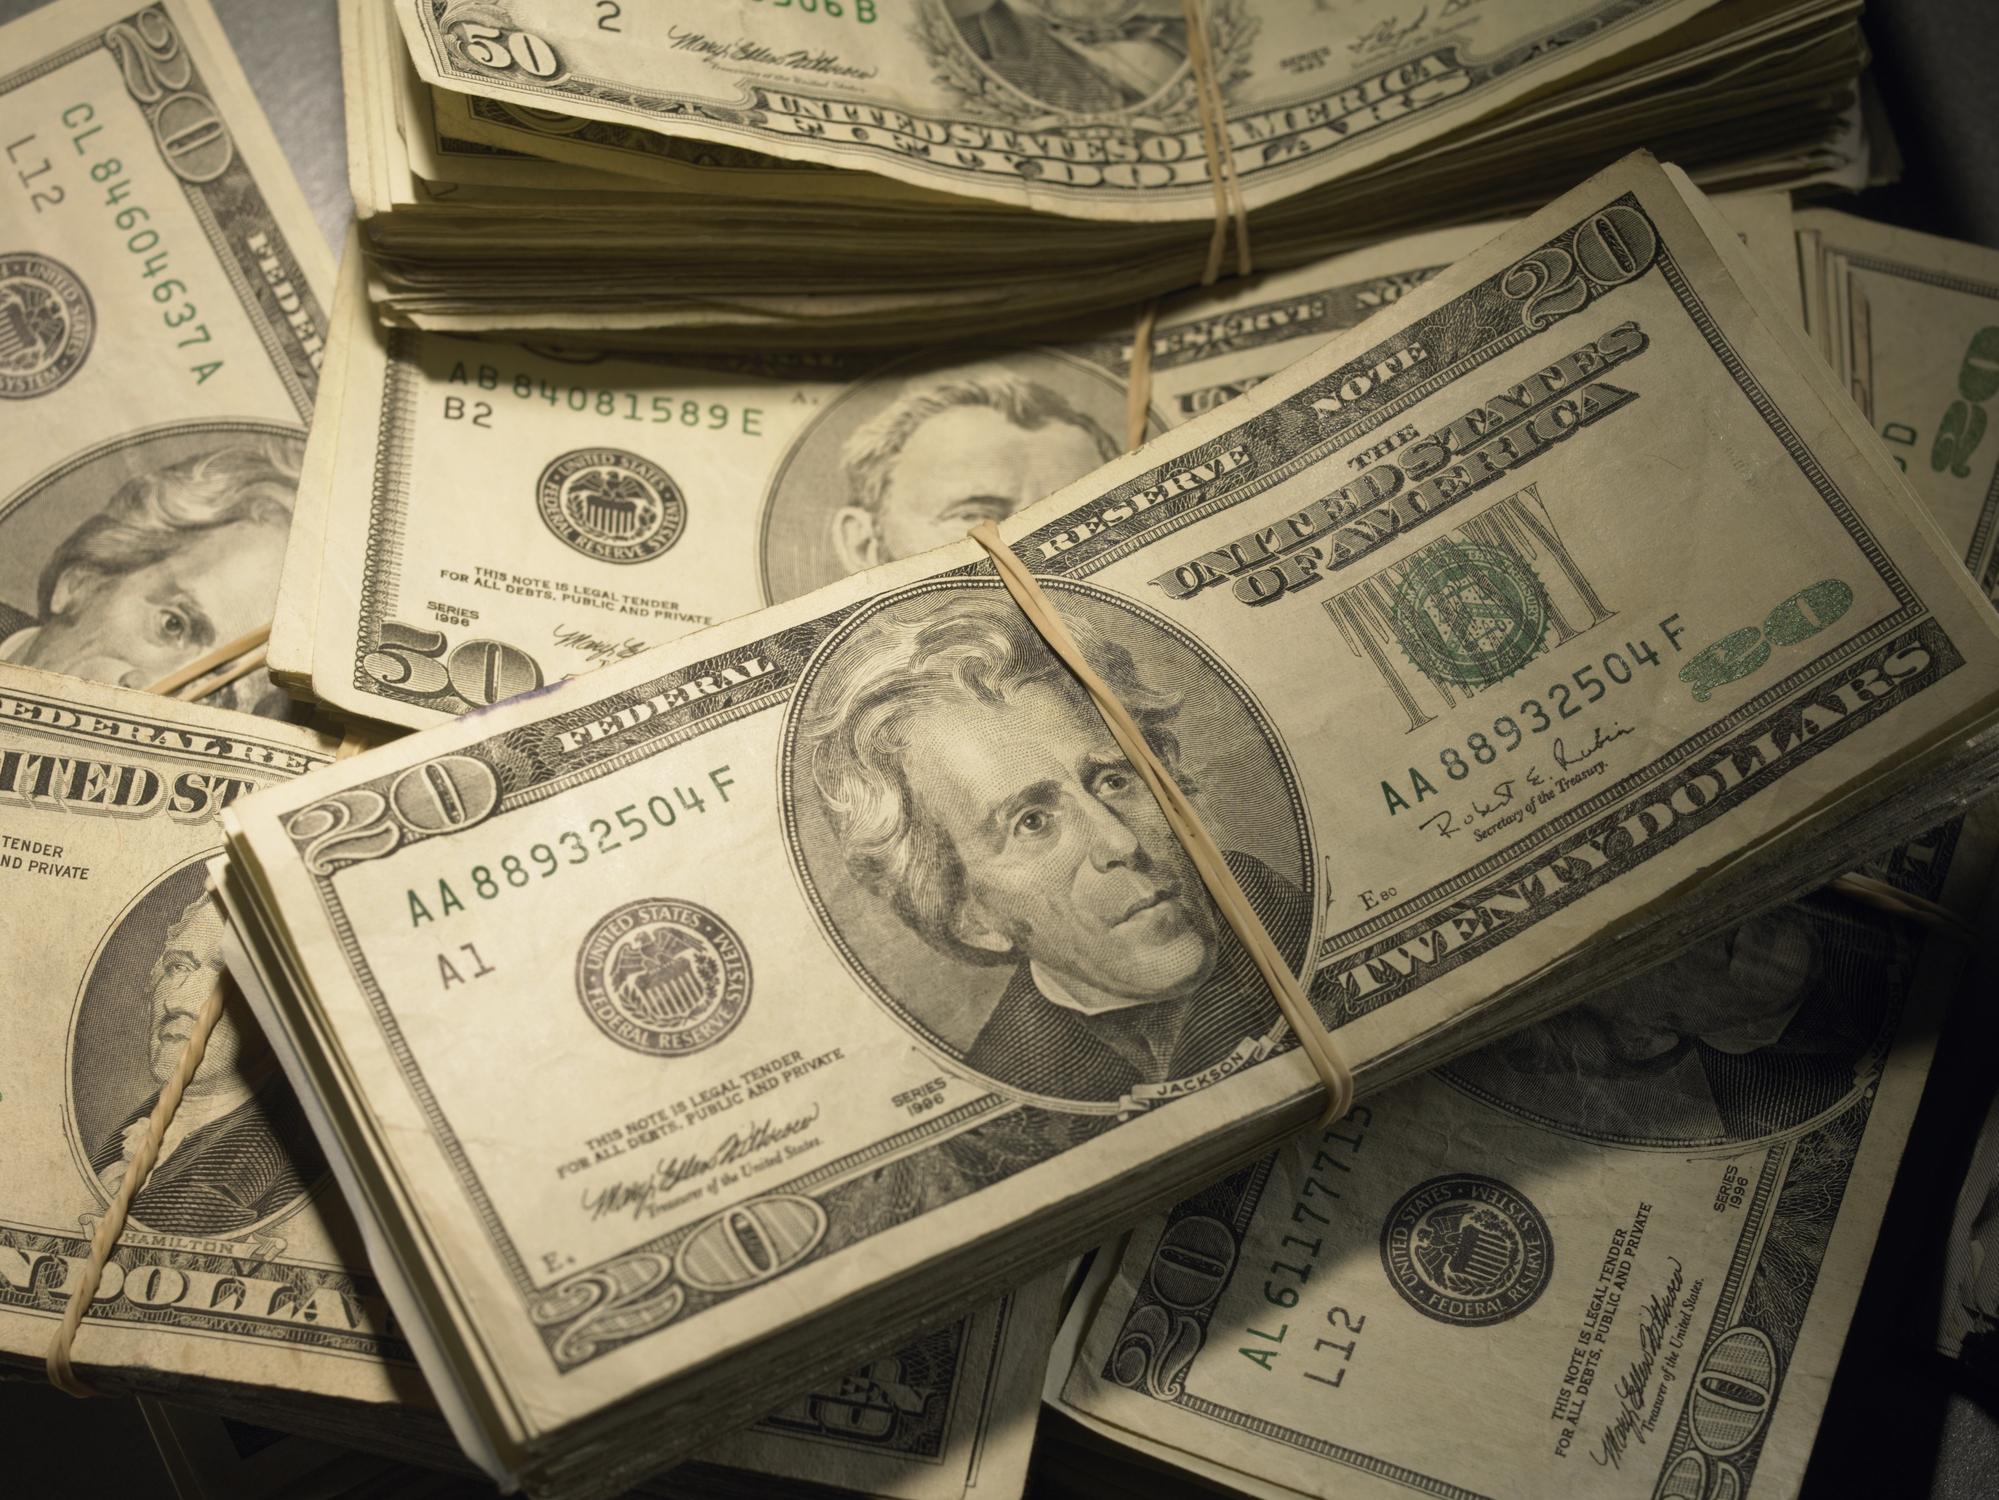 Stacks of $20 and $50 bills.